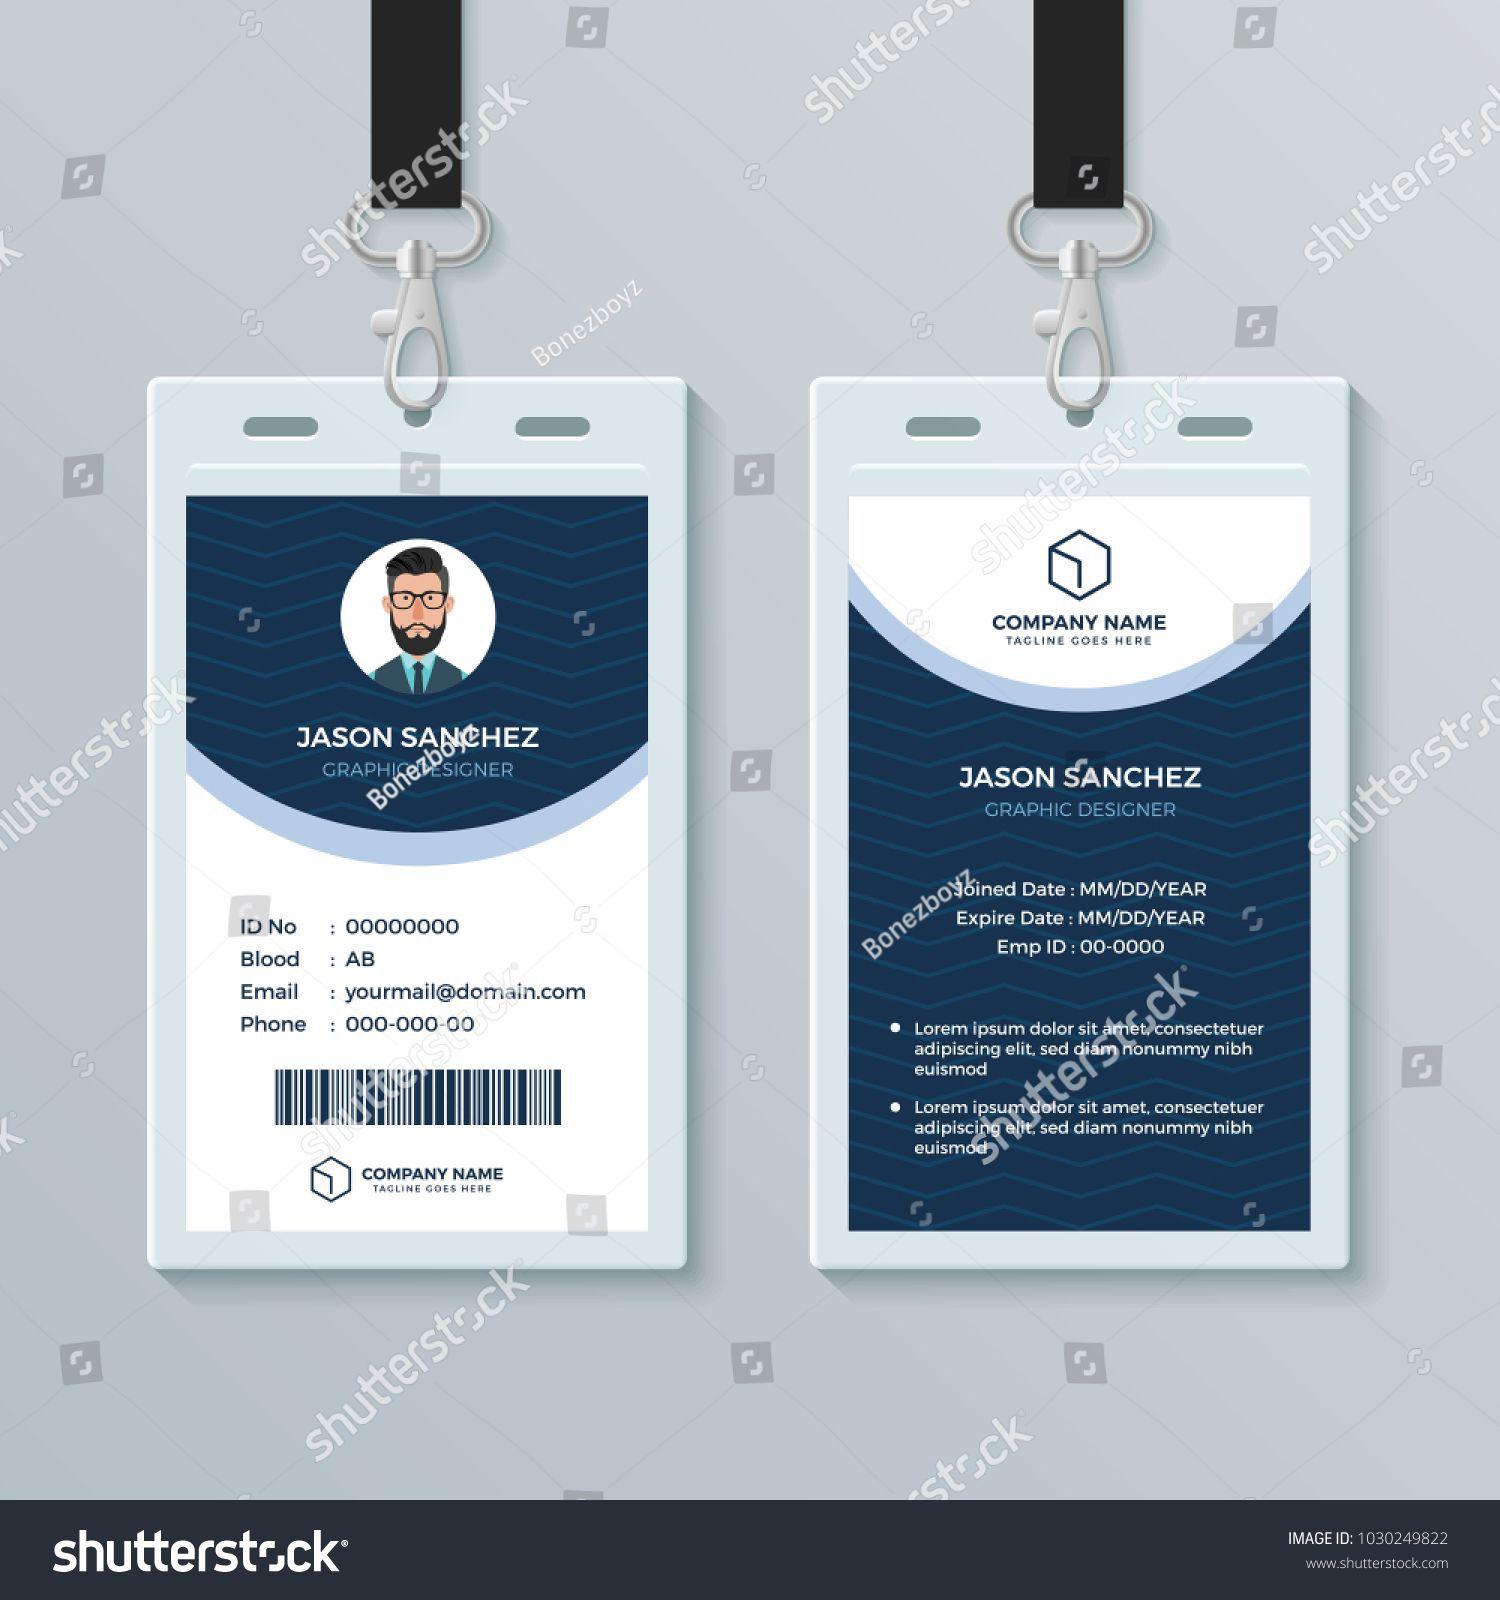 005 Impressive Id Badge Template Free Online High Def Full